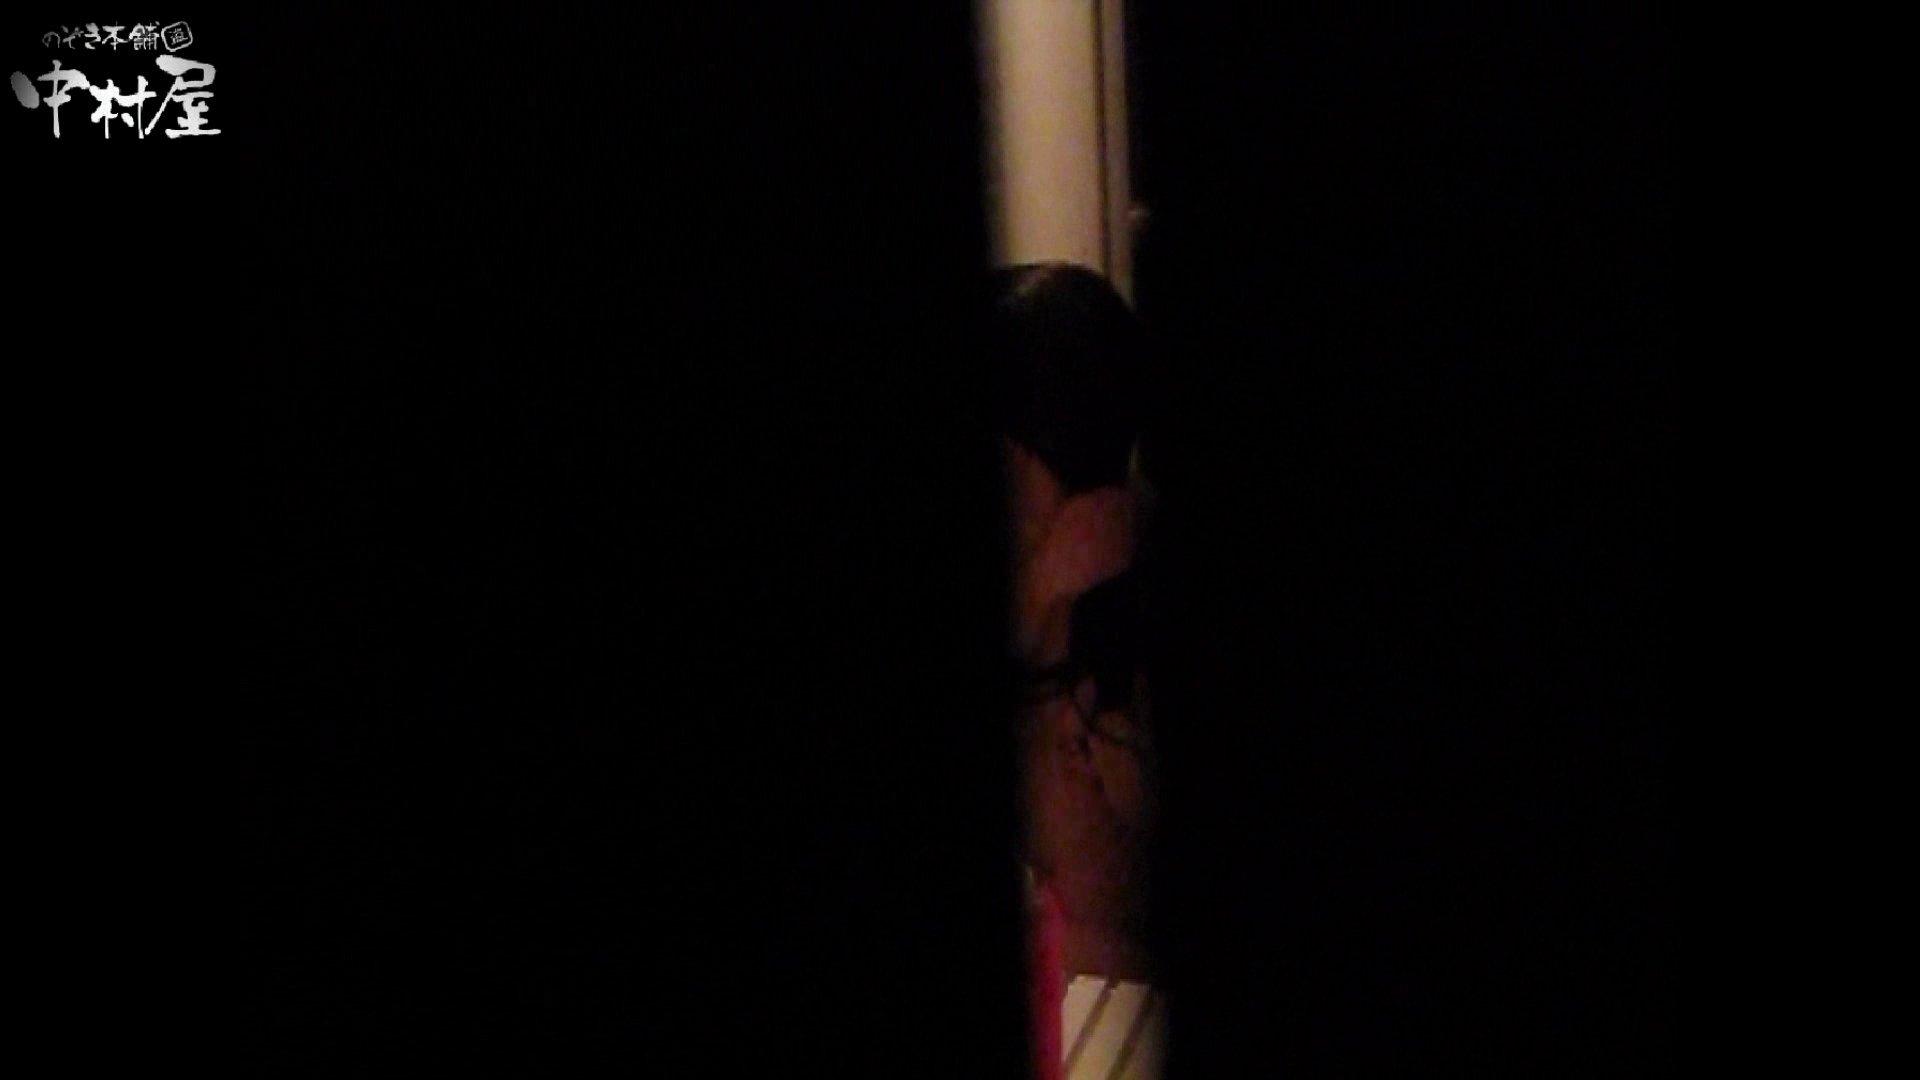 民家風呂専門盗撮師の超危険映像 vol.004 オンナ達股間 エロ画像 10枚 8